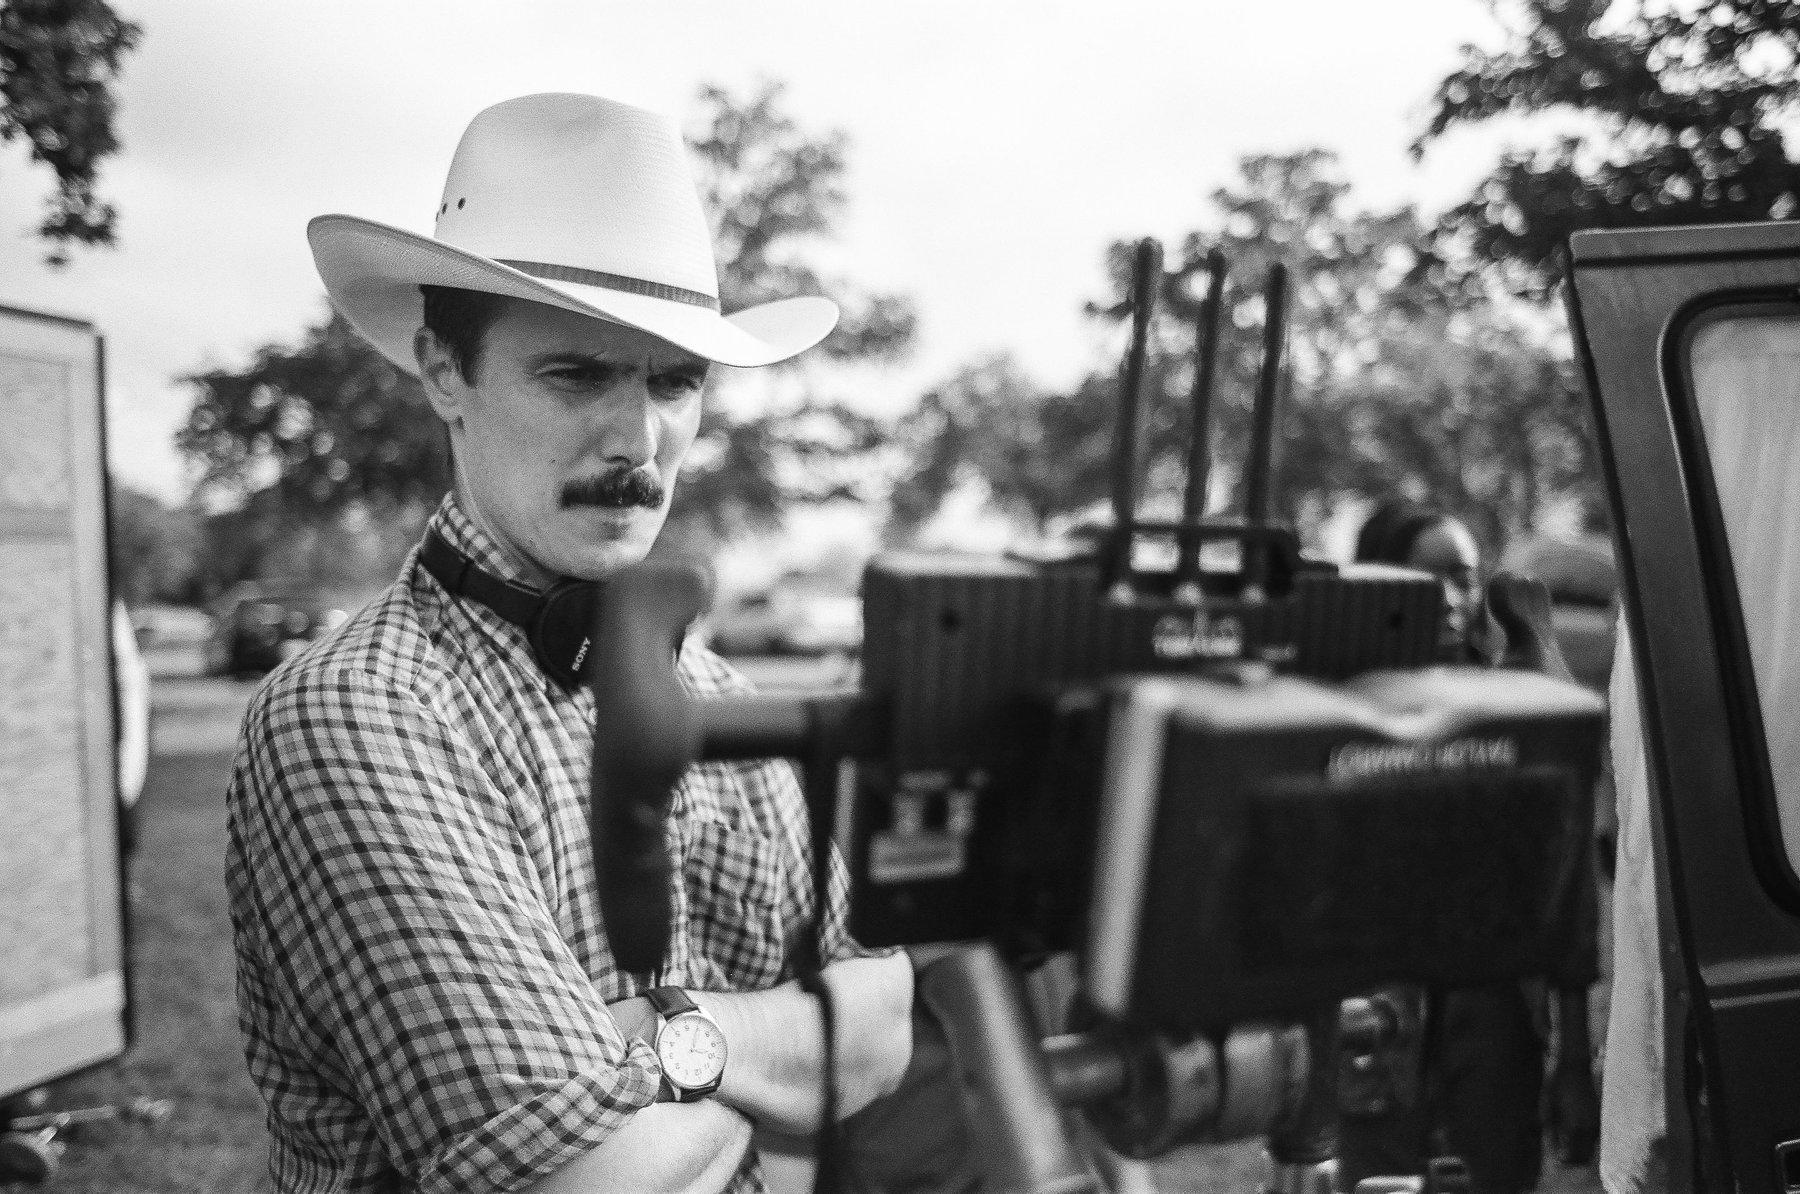 John Valley on set, c/o johnvalleyworks.com